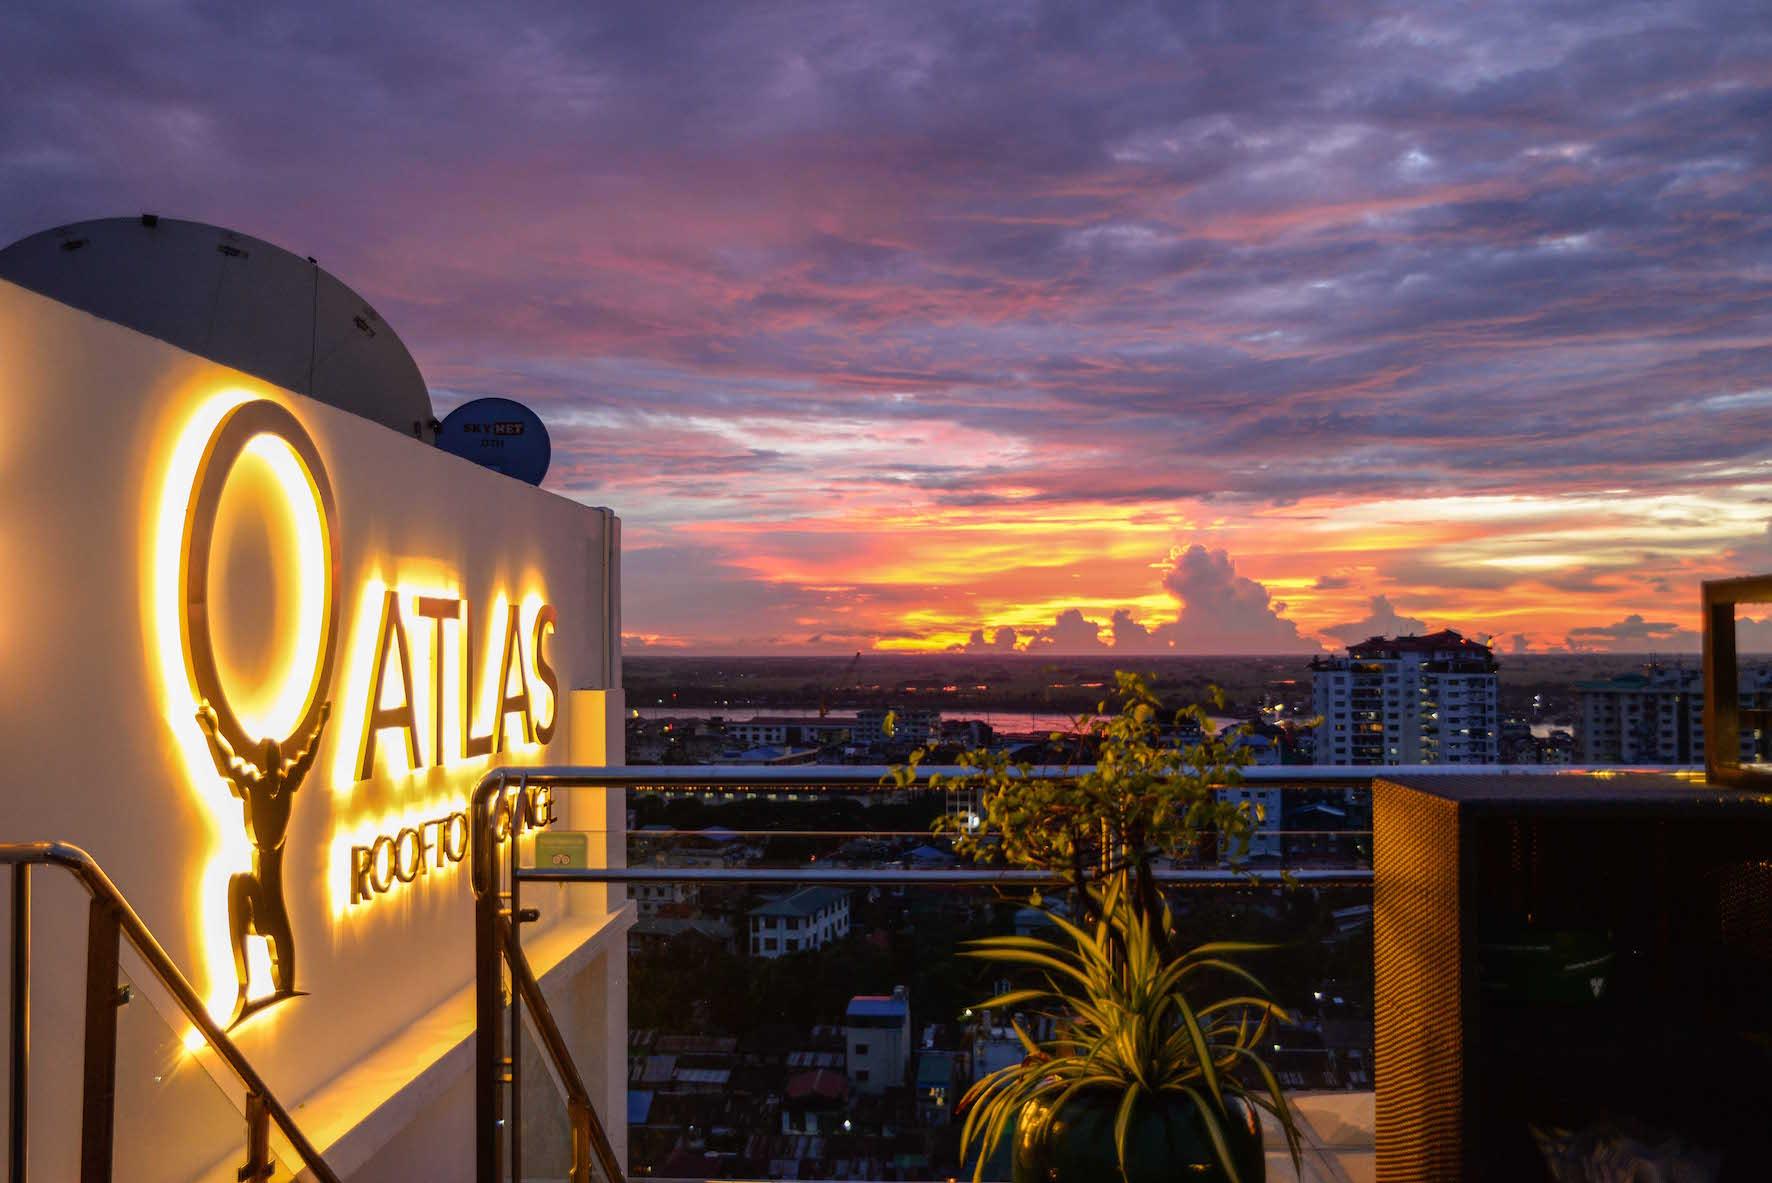 Sonnenroete auf der Atlas Rooftop Bar in Yangon